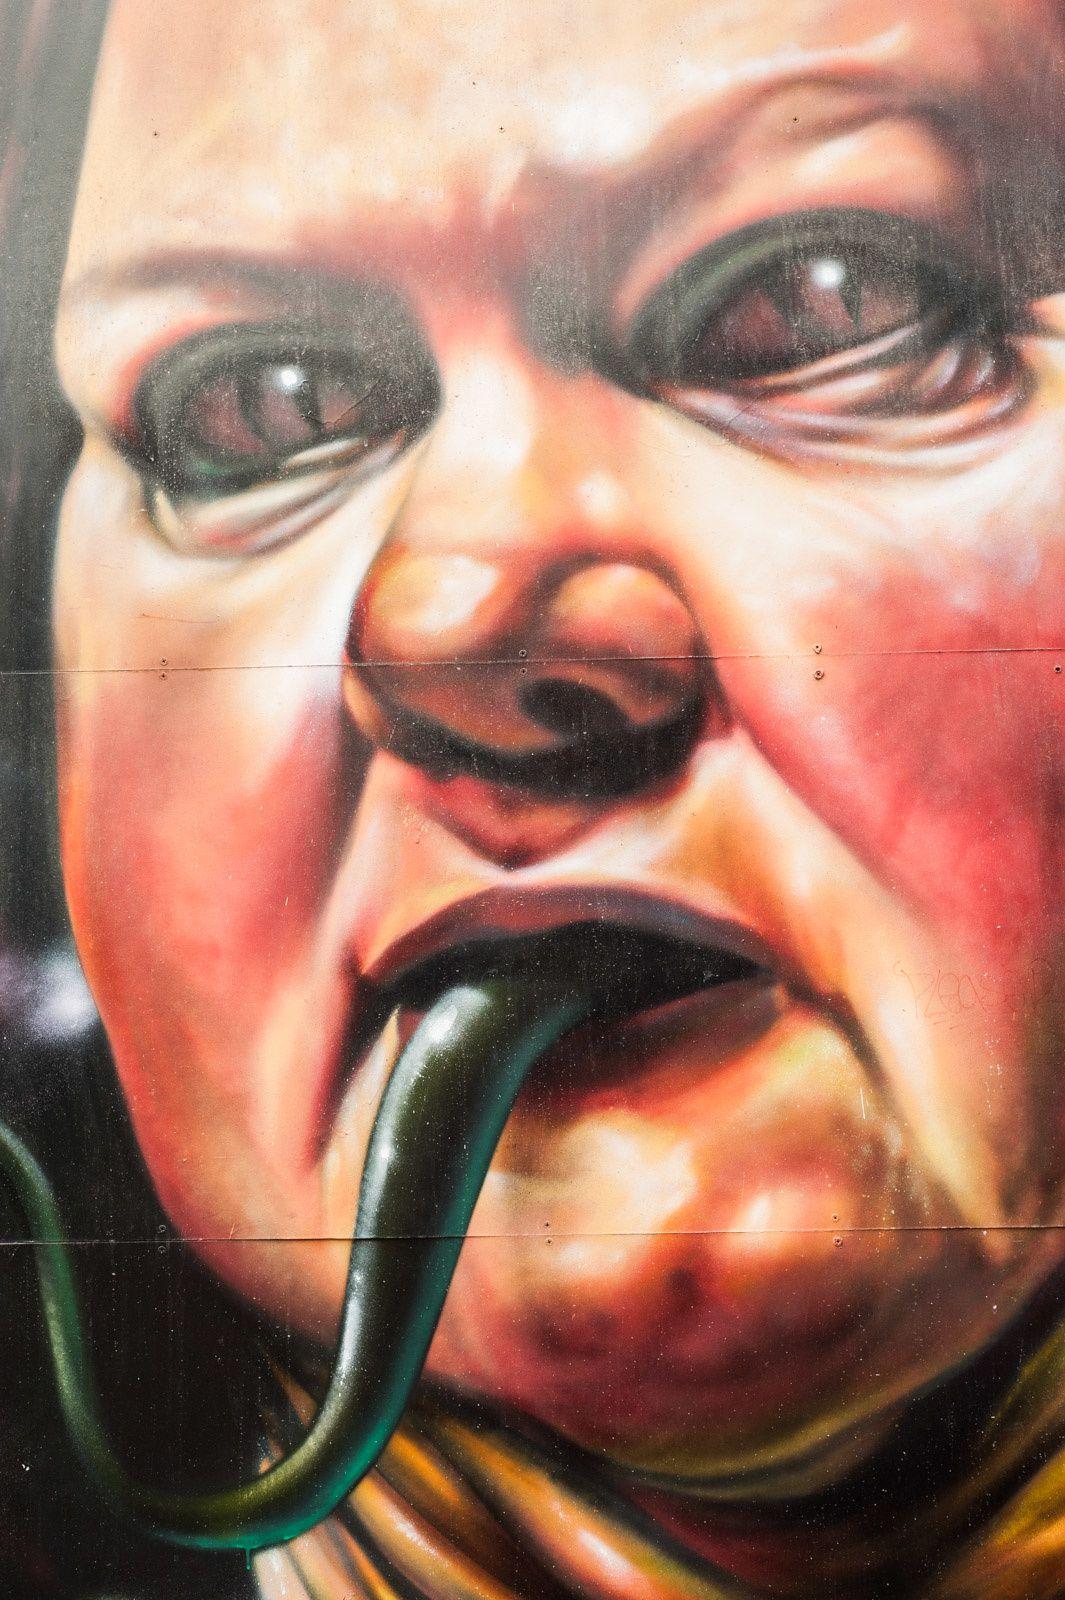 VIctoria, Australia, Take 1 - Le Street Art au poil de Melbourne